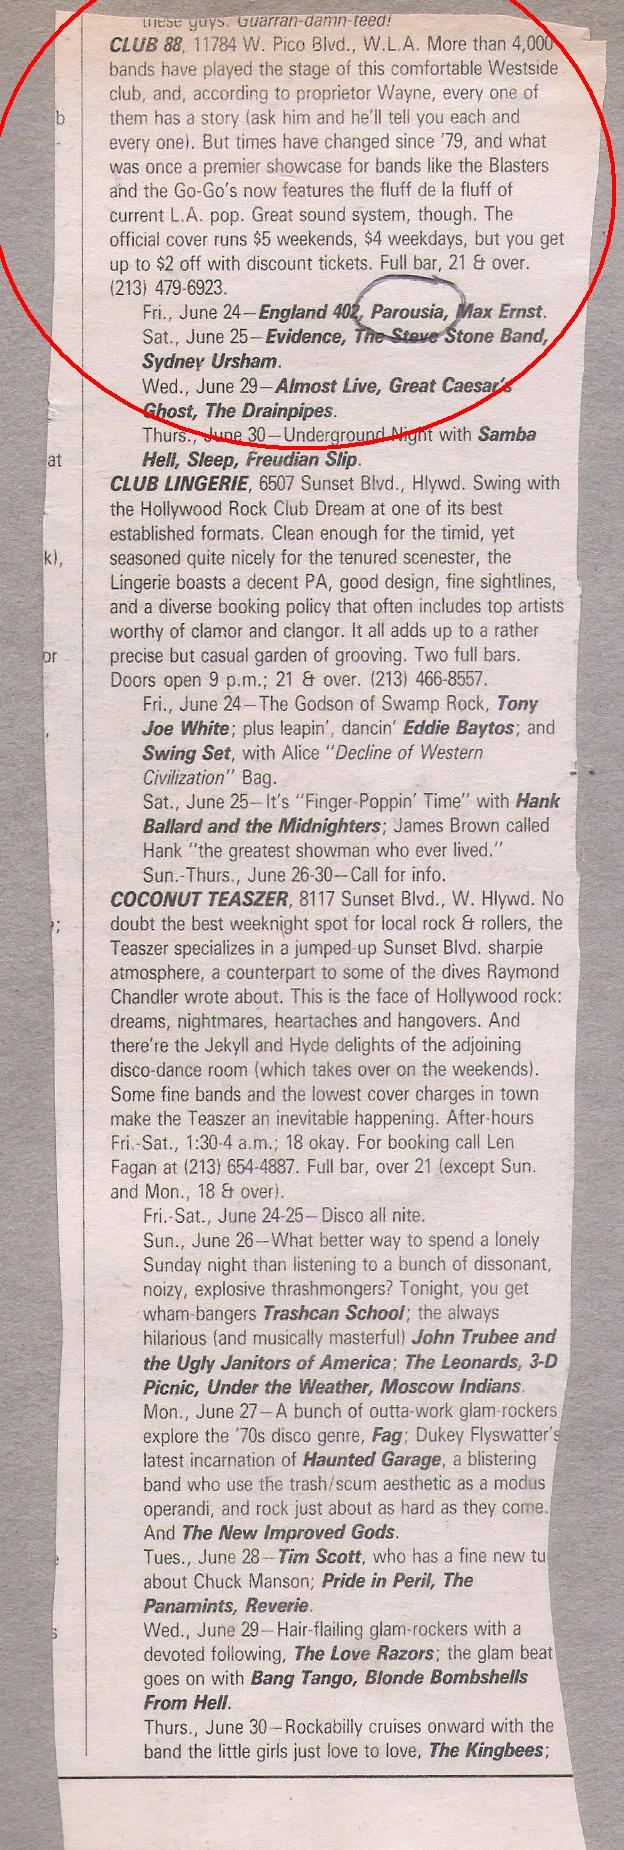 LA Weekly live music list: Club June 24, 1988